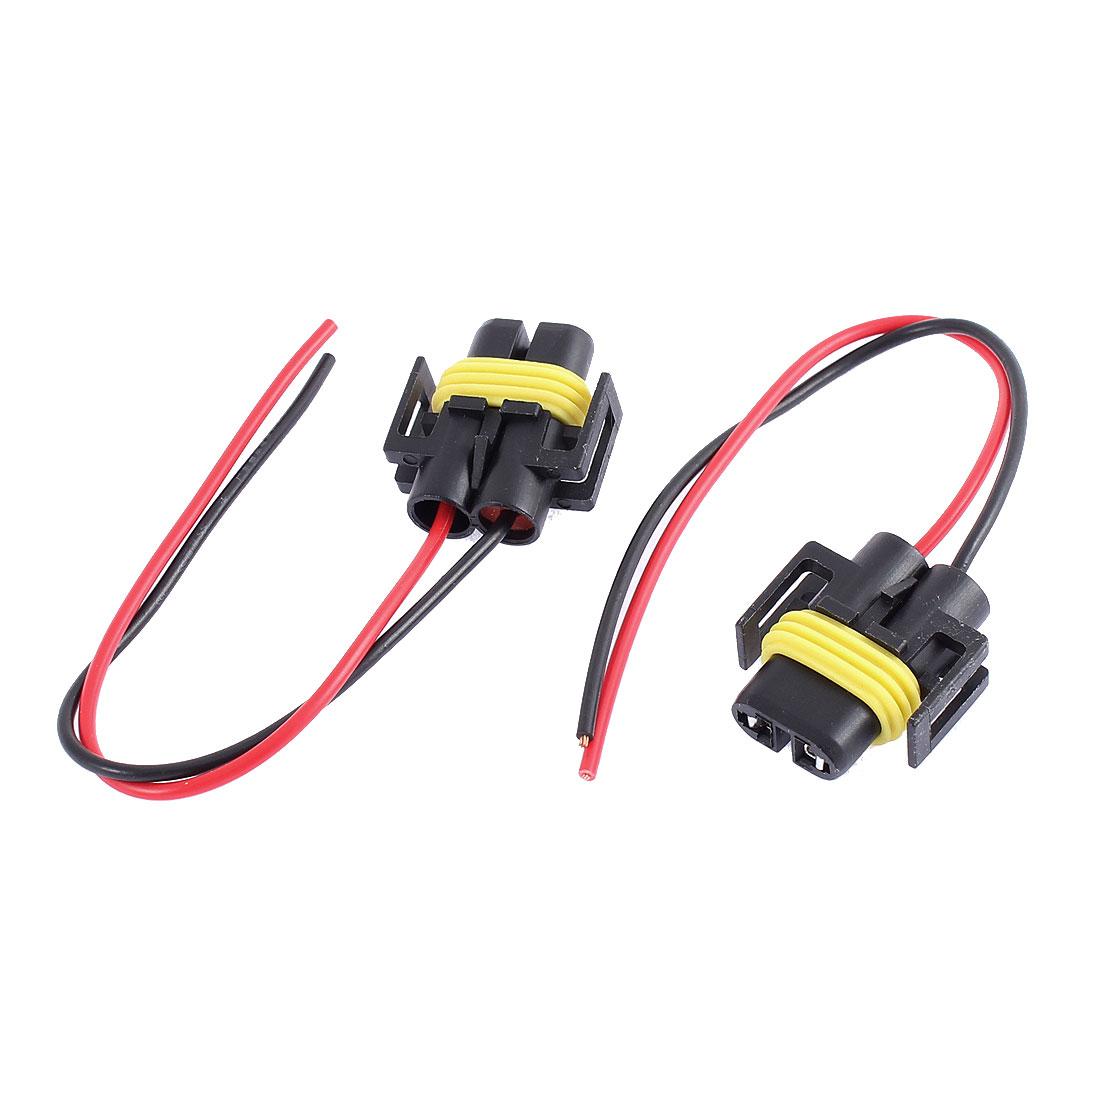 2 Pcs H11 Headlight Fog Light Connector Socket for Vehicle